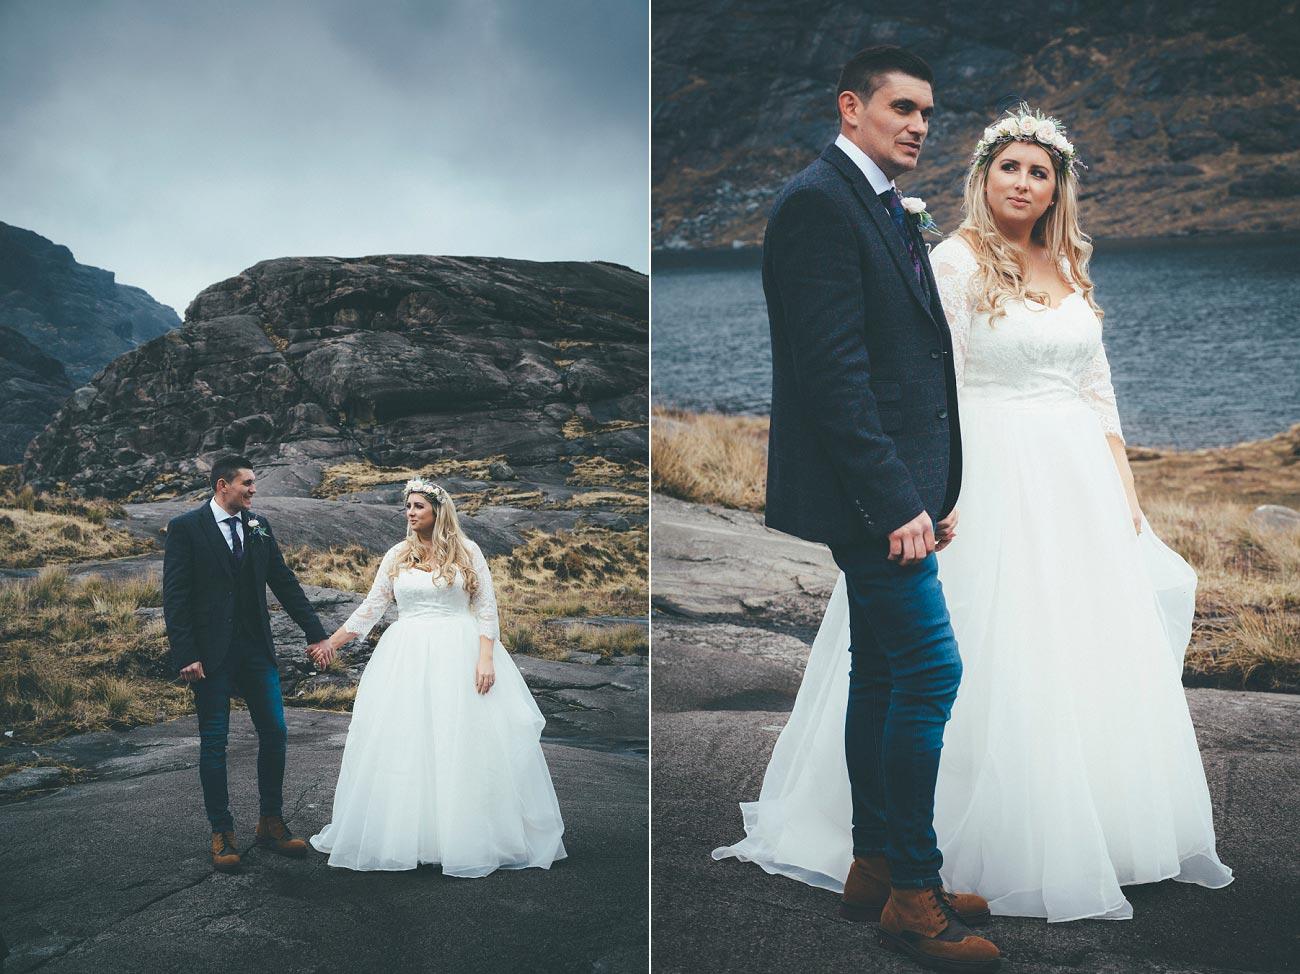 isle of skye wedding loch coruisk small outdoor wedding photography scotland scottish highlands photographer 0029